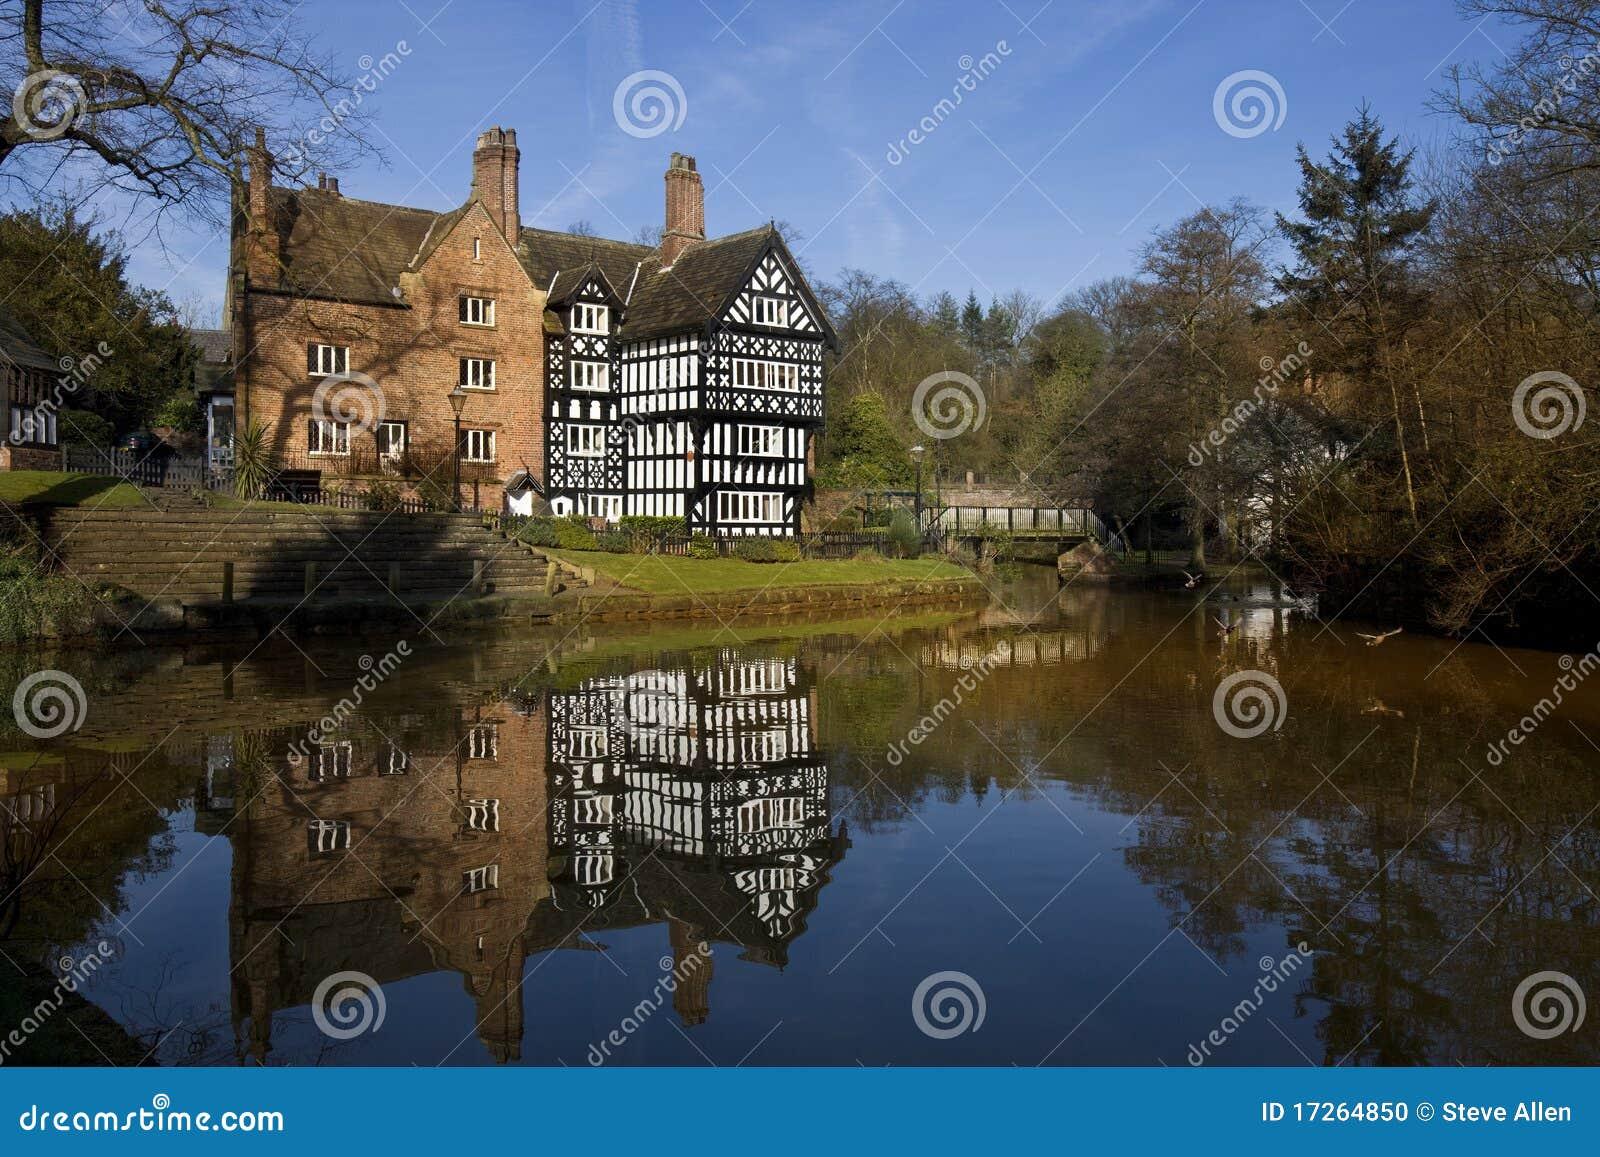 Tudor Building - Bridgewater Canal - England